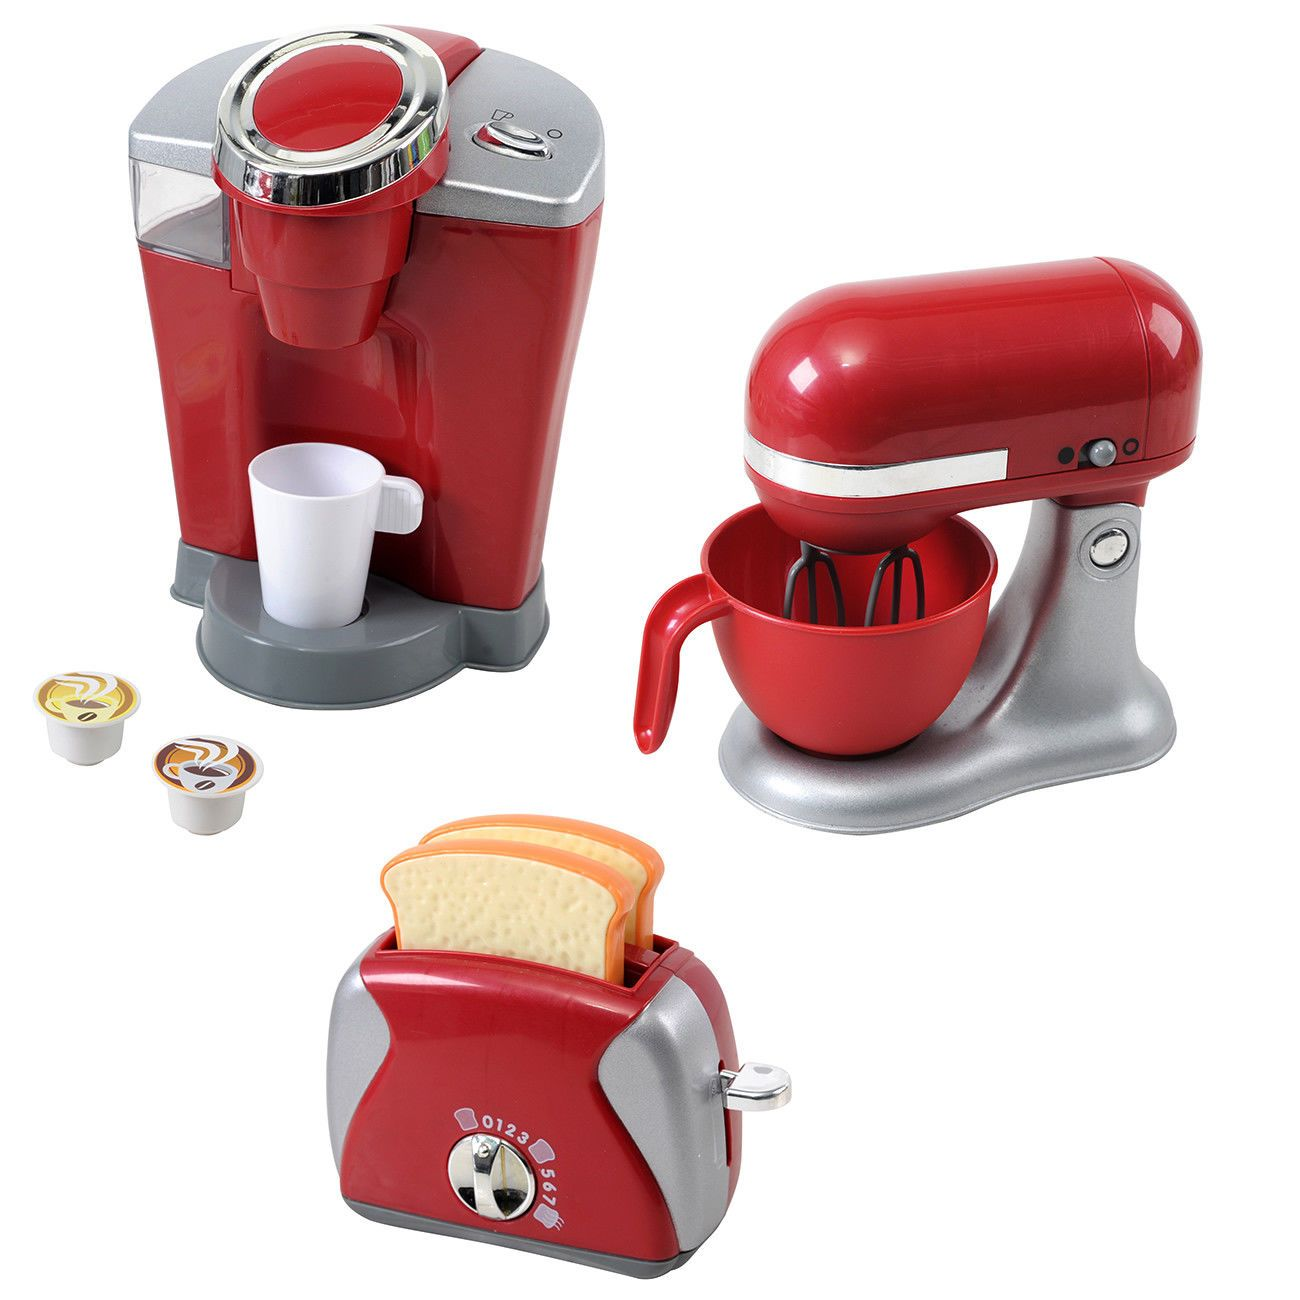 3 Piece Appliances Kids Kitchen Toys Gourmet Cook Food Pretend Play